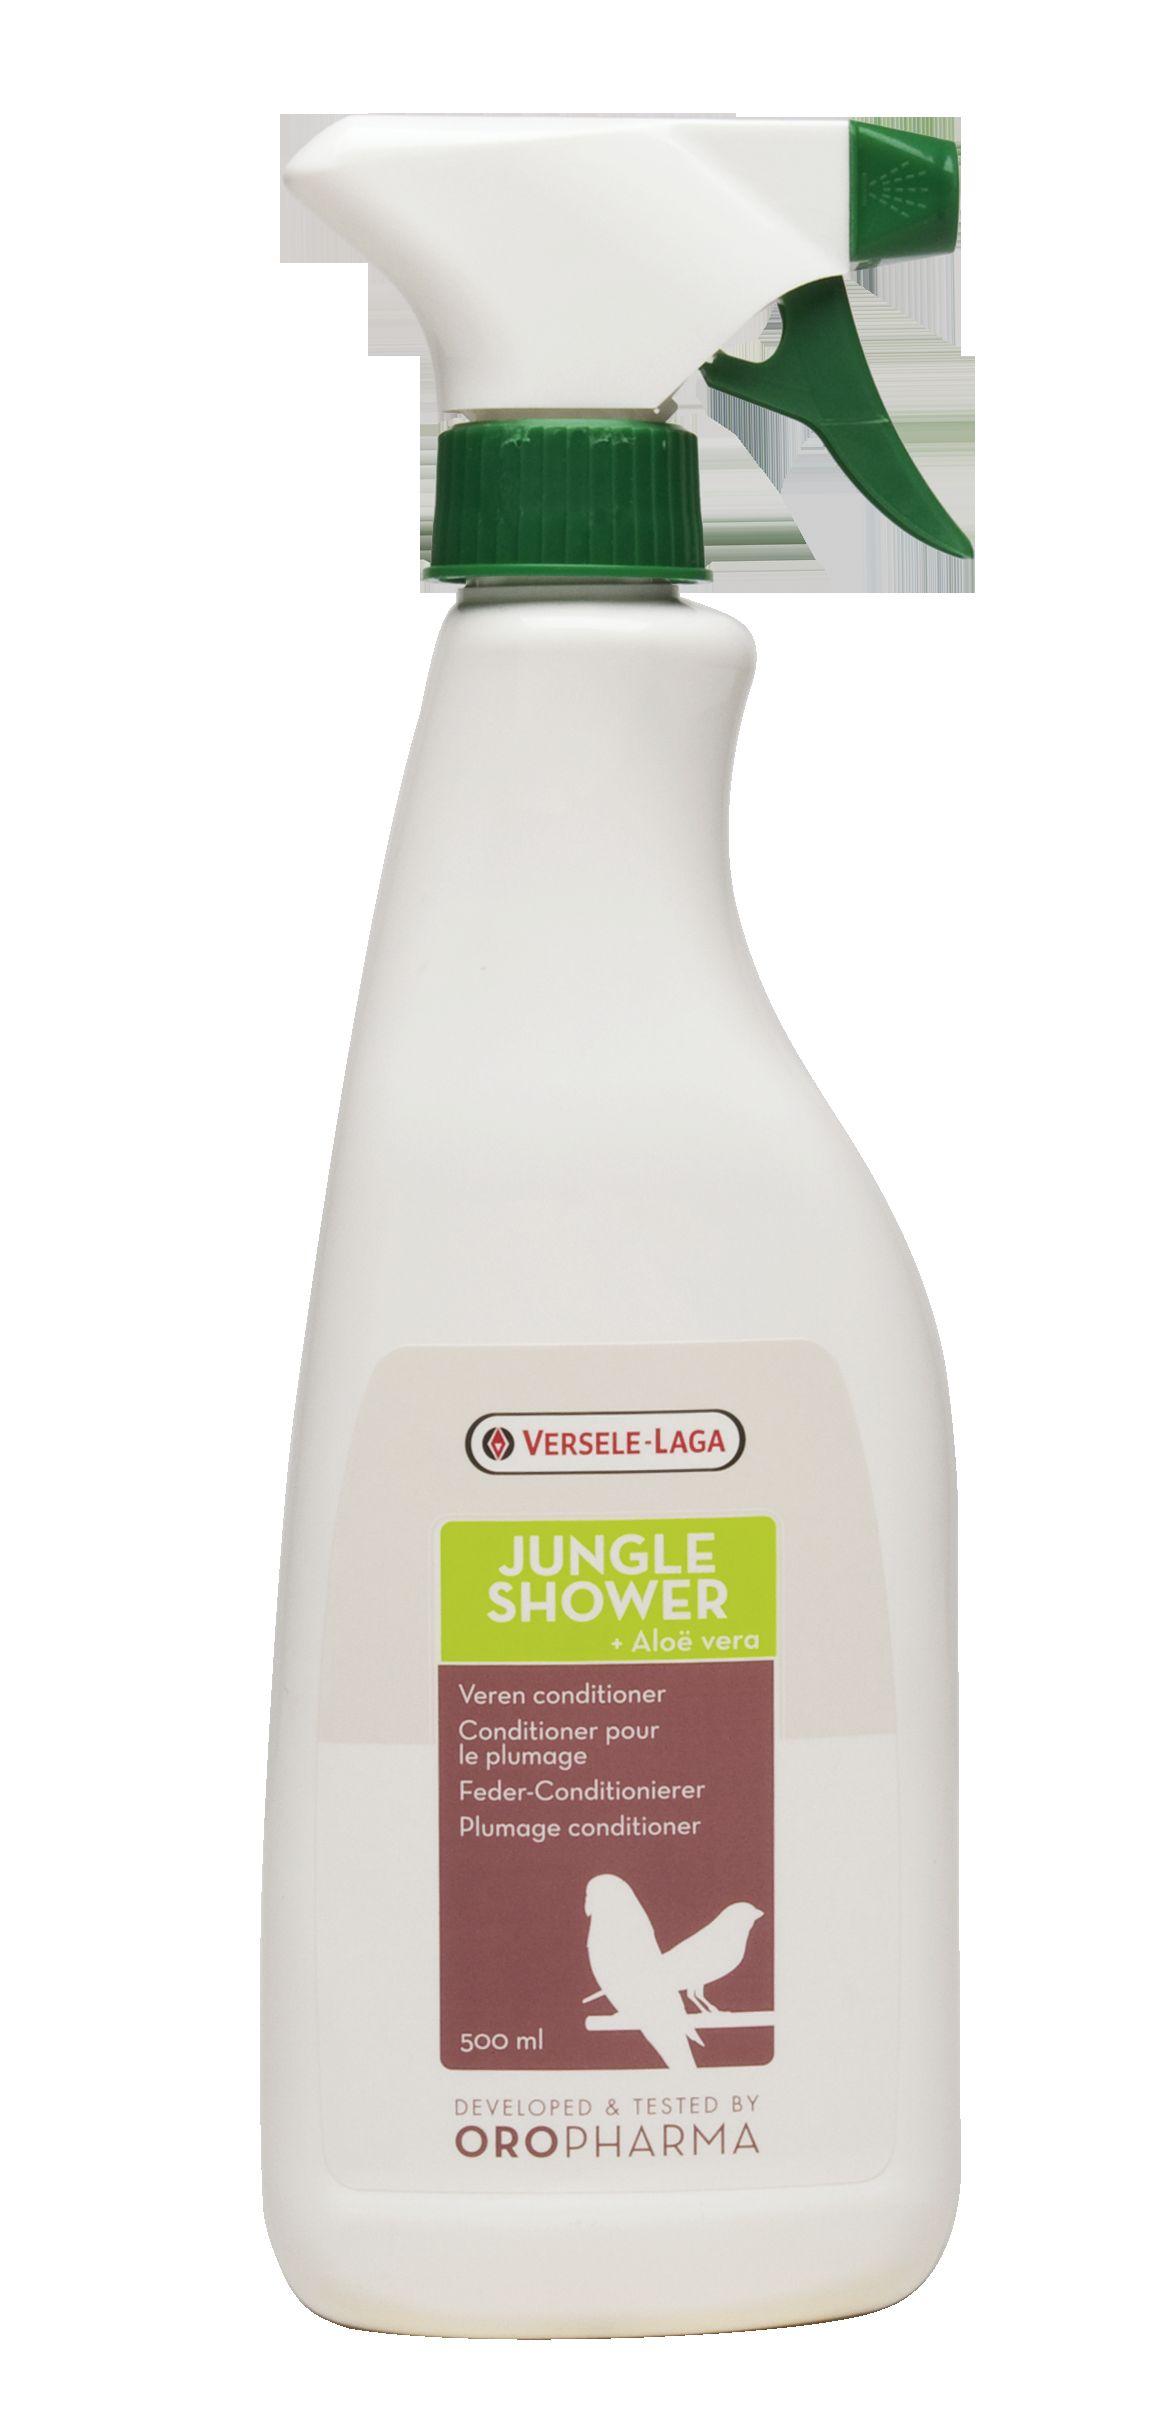 Jungle shower   500ml